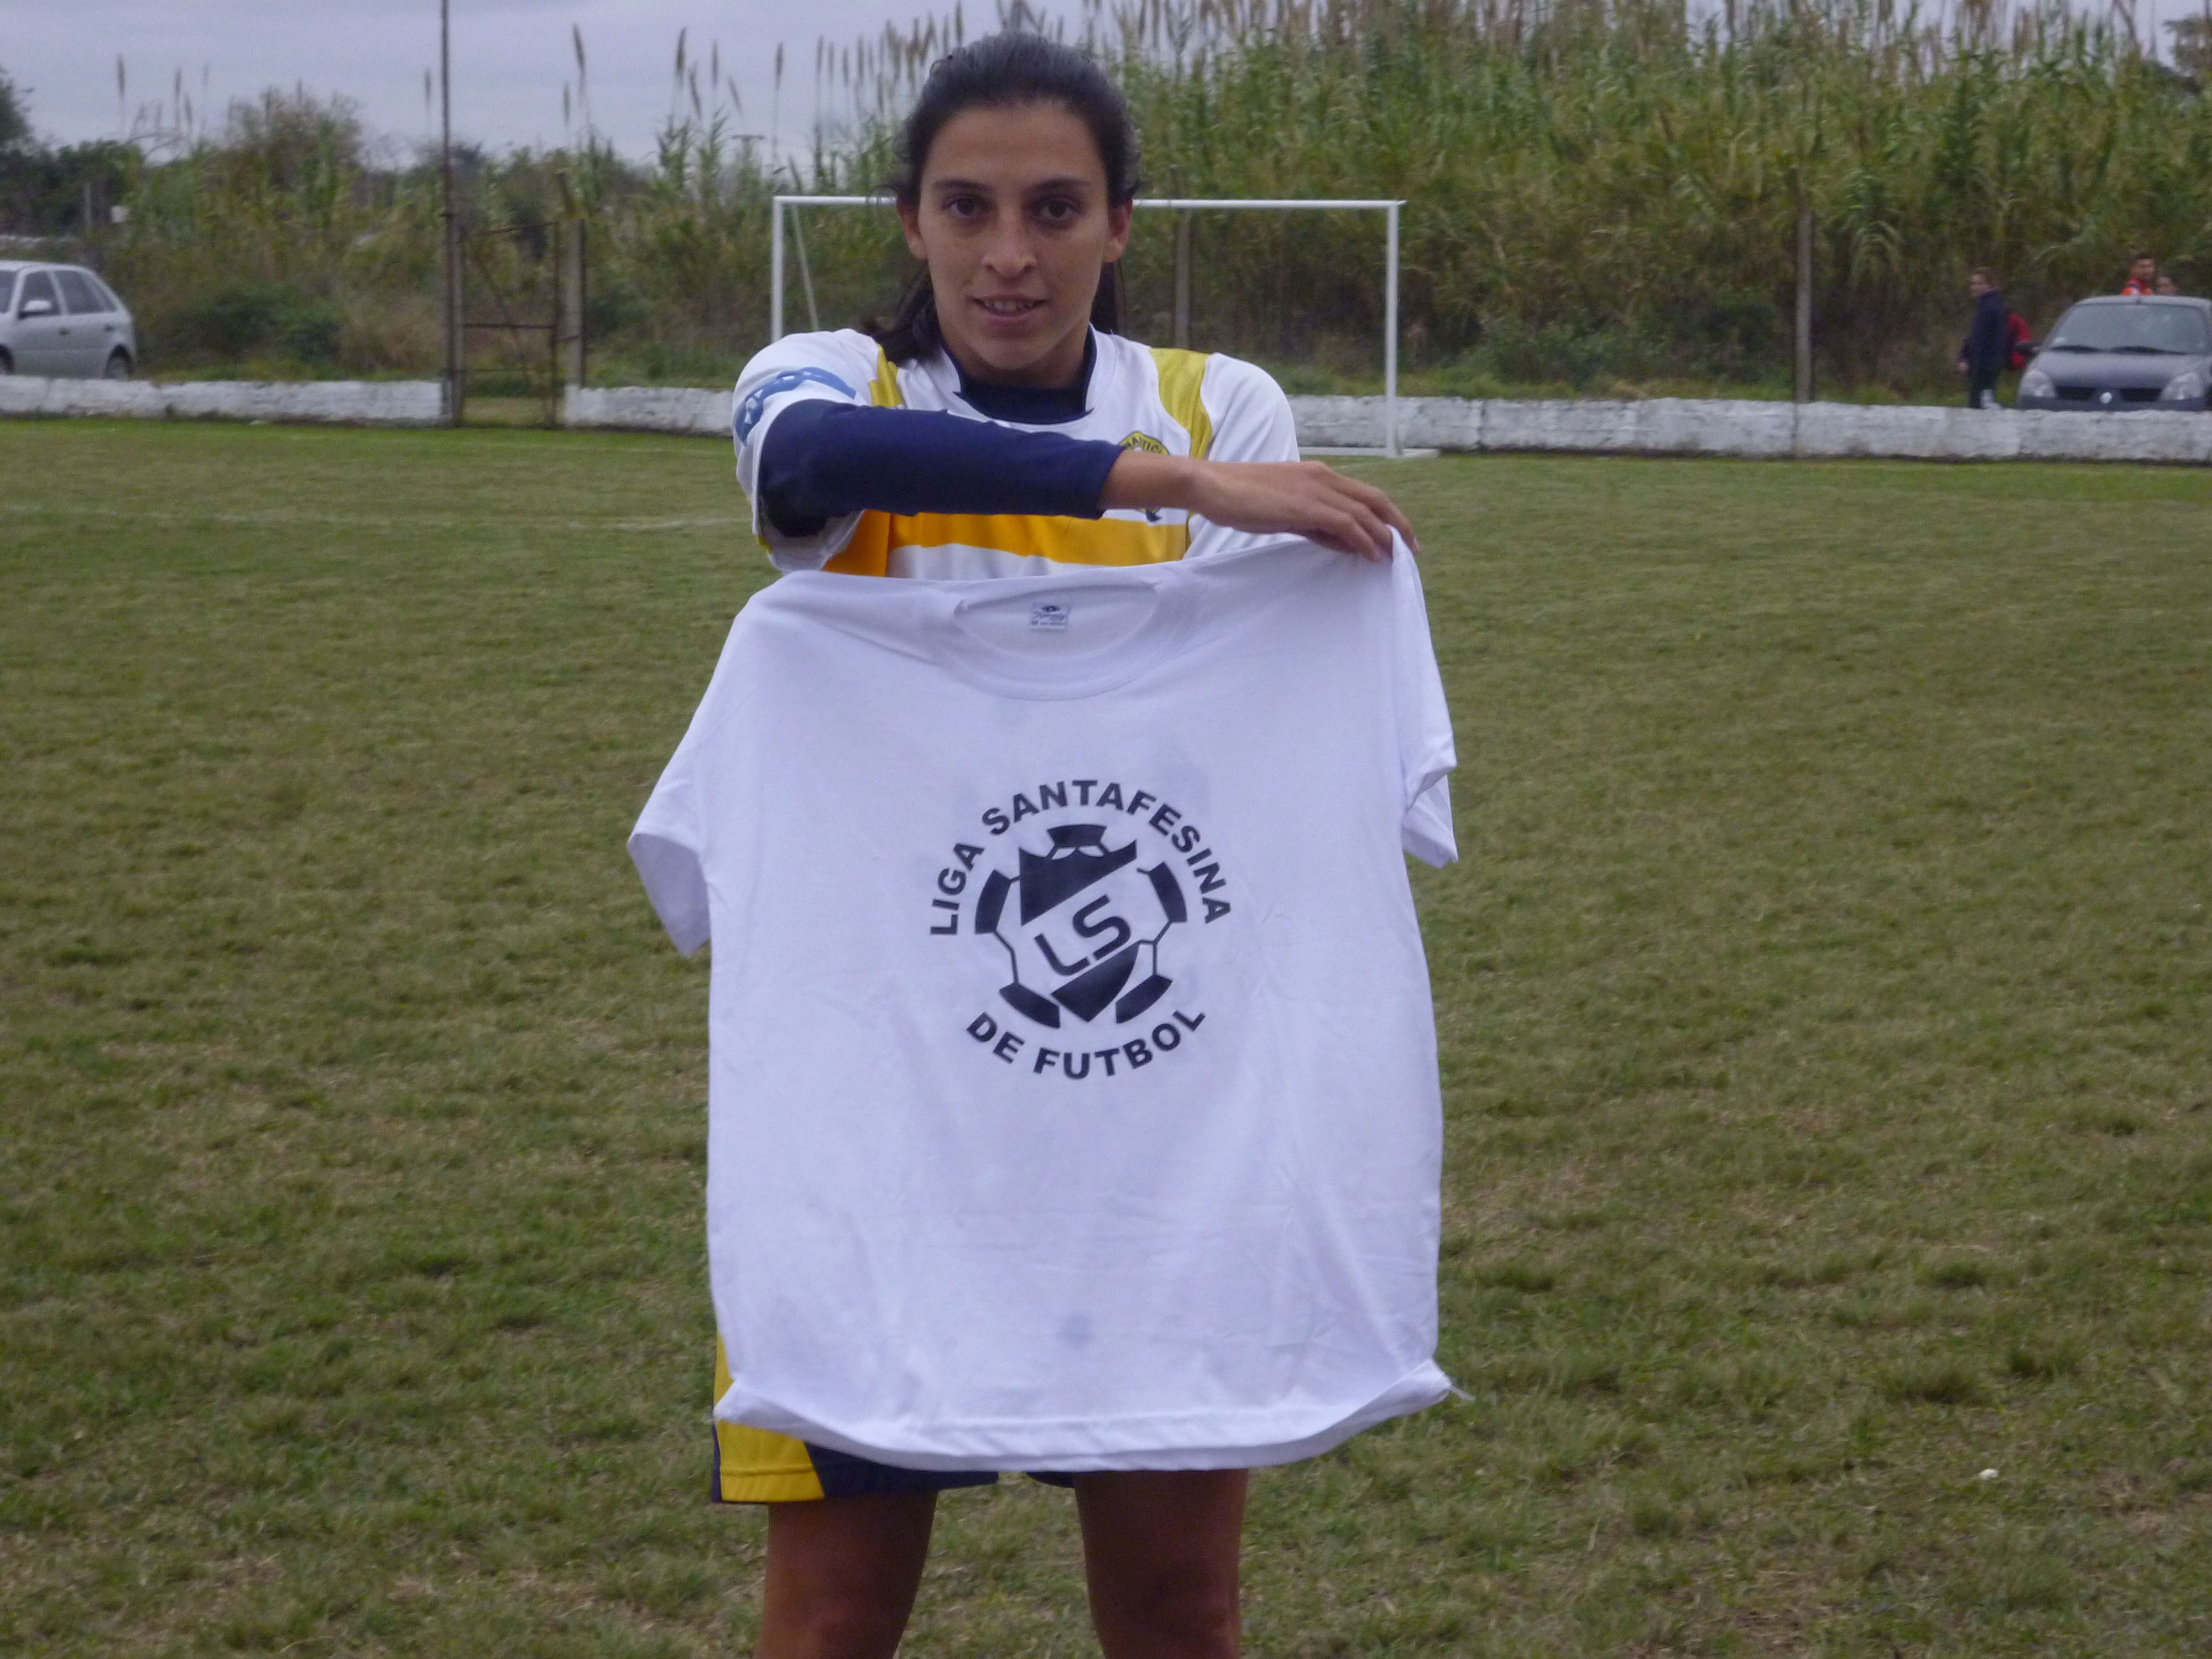 Elizabeth Noemí Martínez